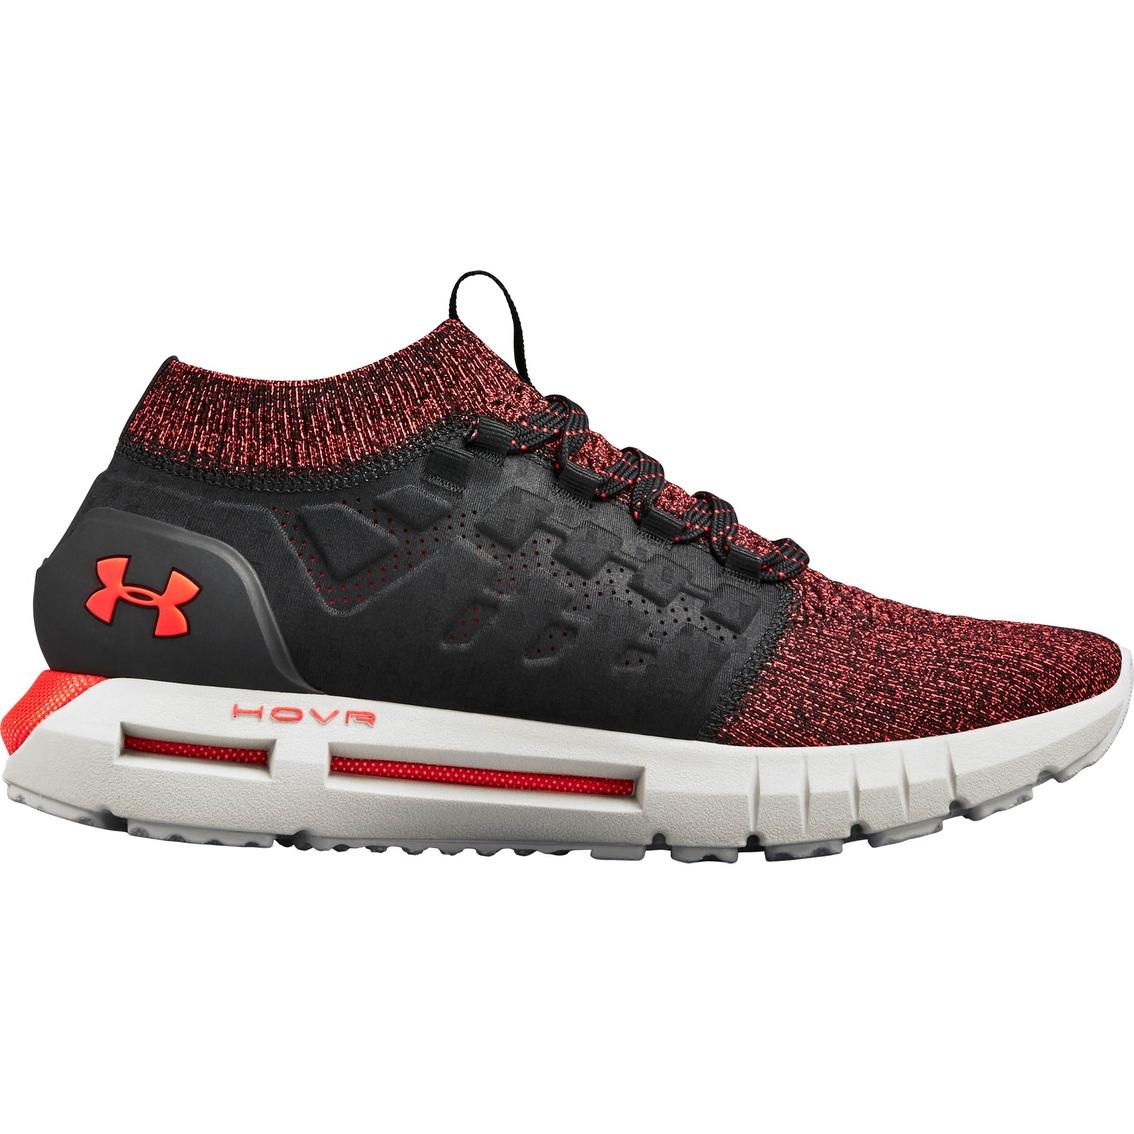 d7b846dc06 Under Armour Men s Ua Hovr Phantom Nc Running Shoes